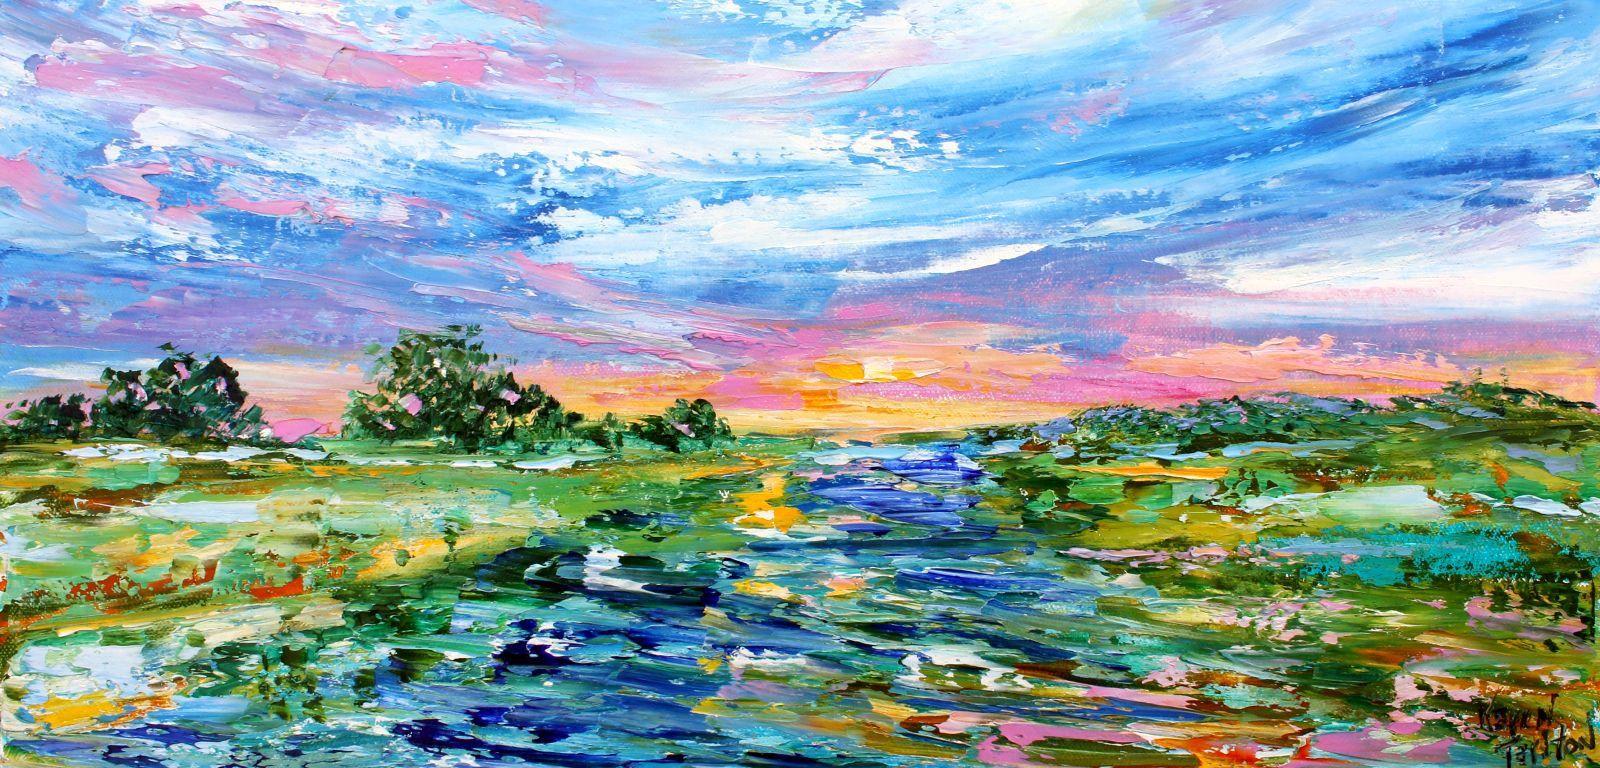 Marsh Sunrise Landscape Painting In Oil Palette Knife Impressionism On Canvas Fine Art By Karen Ta Landscape Paintings Oil Painting Landscape Sunrise Landscape